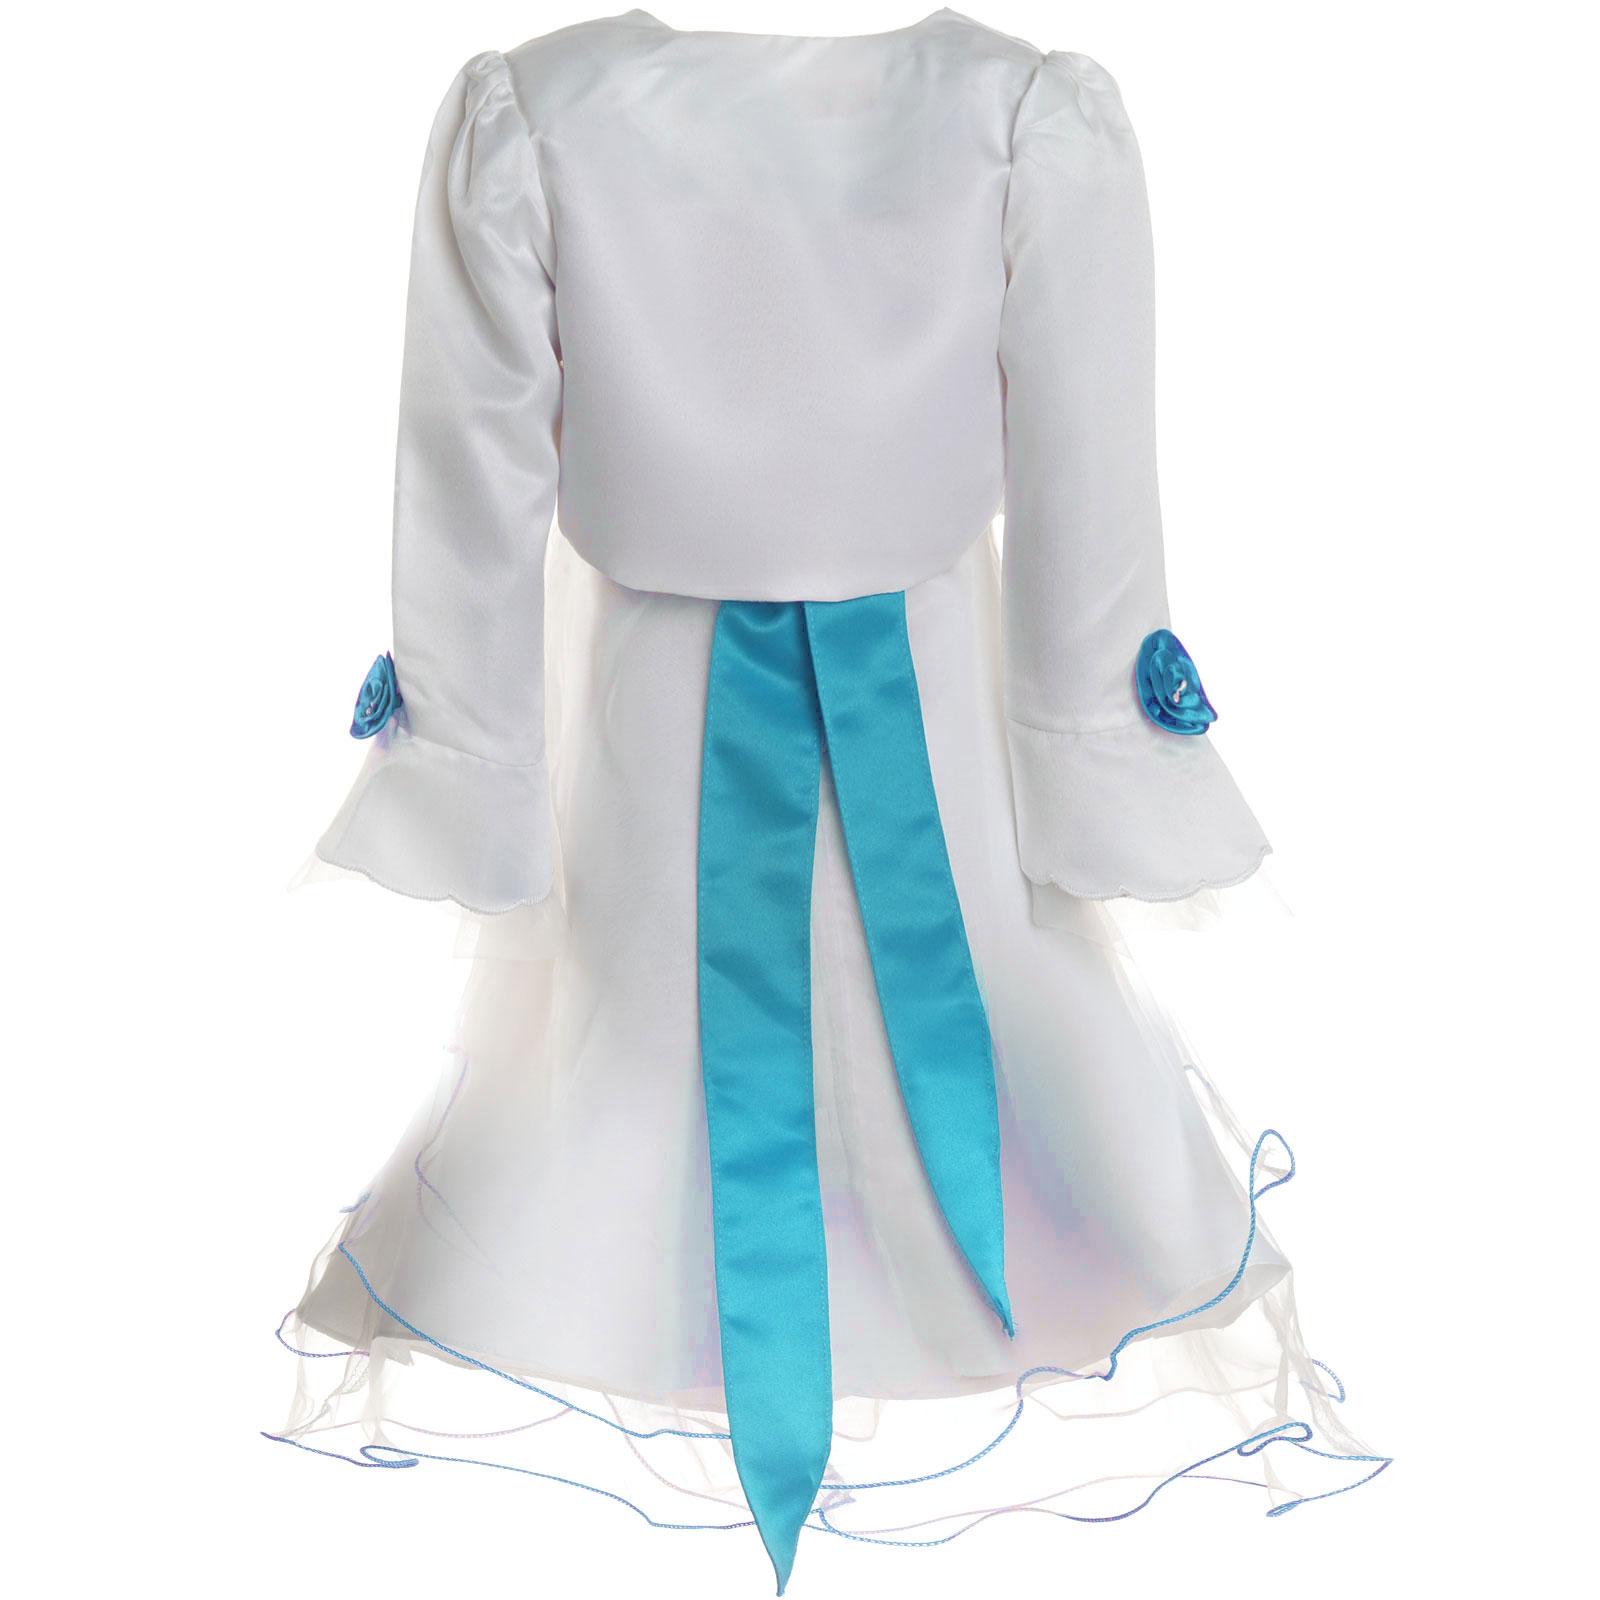 Maedchen-Kinder-Kleid-Peticoat-Festkleid-Lang-Arm-Kostuem-mit-Bolero-Rose-21476 Indexbild 19